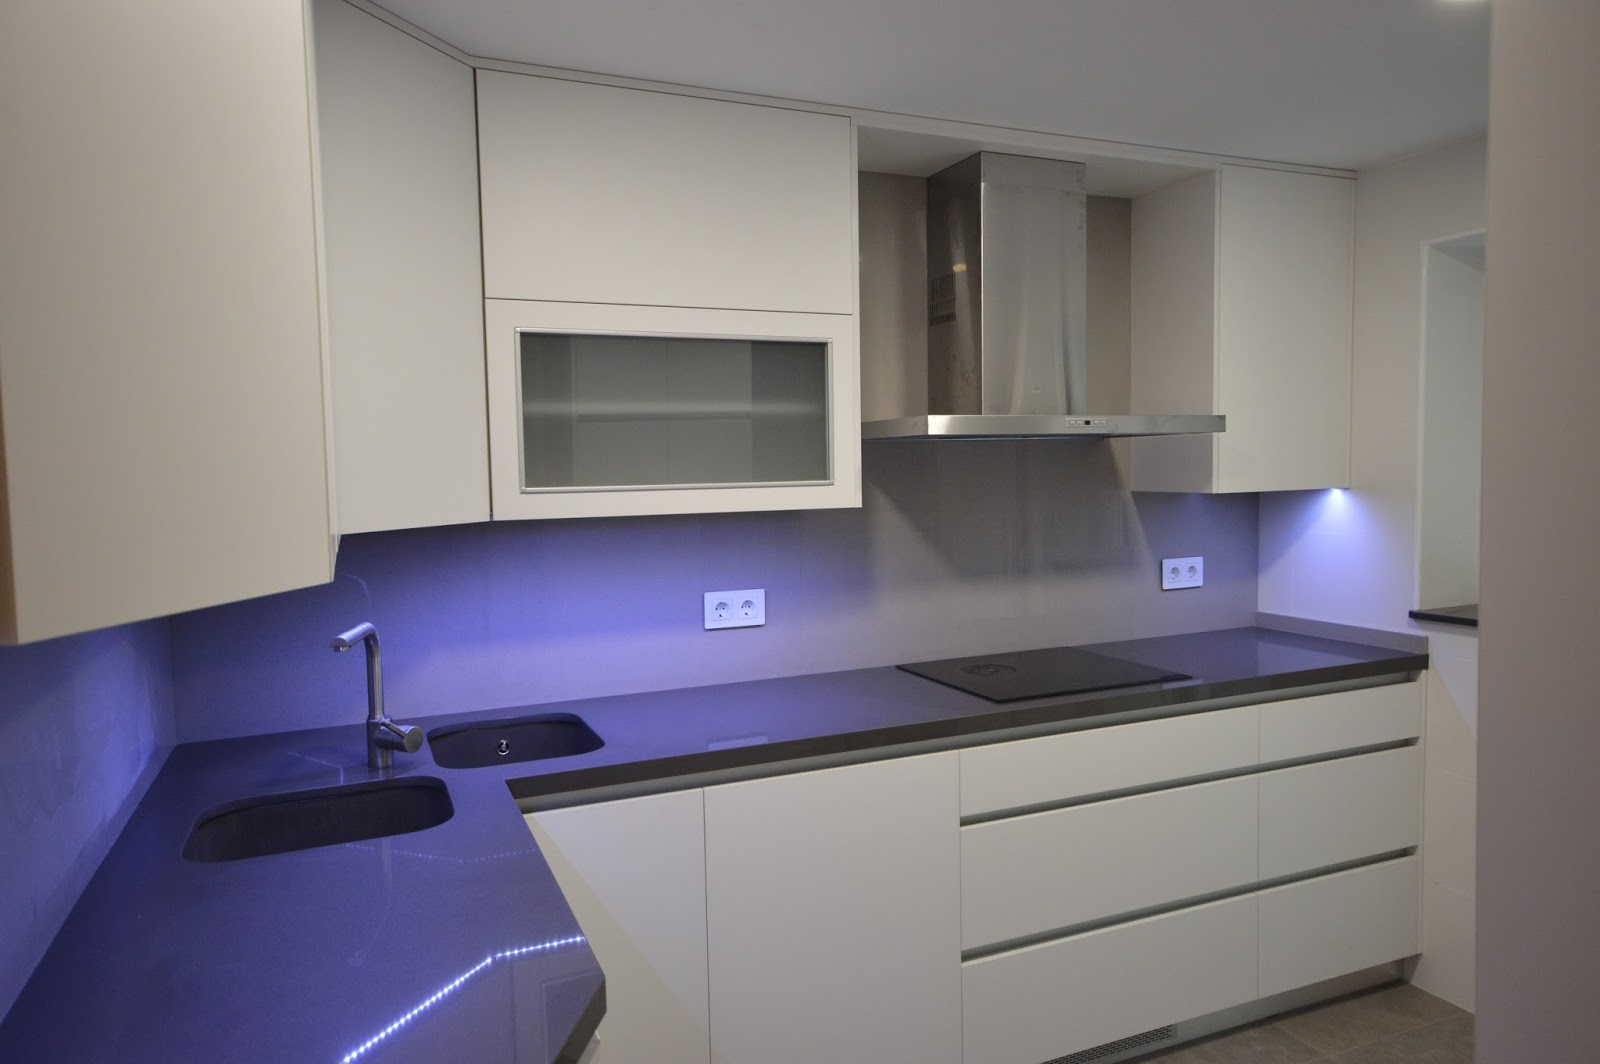 Reuscuina muebles de cocina en blanco mate sin tiradores for Muebles de cocina sin tiradores